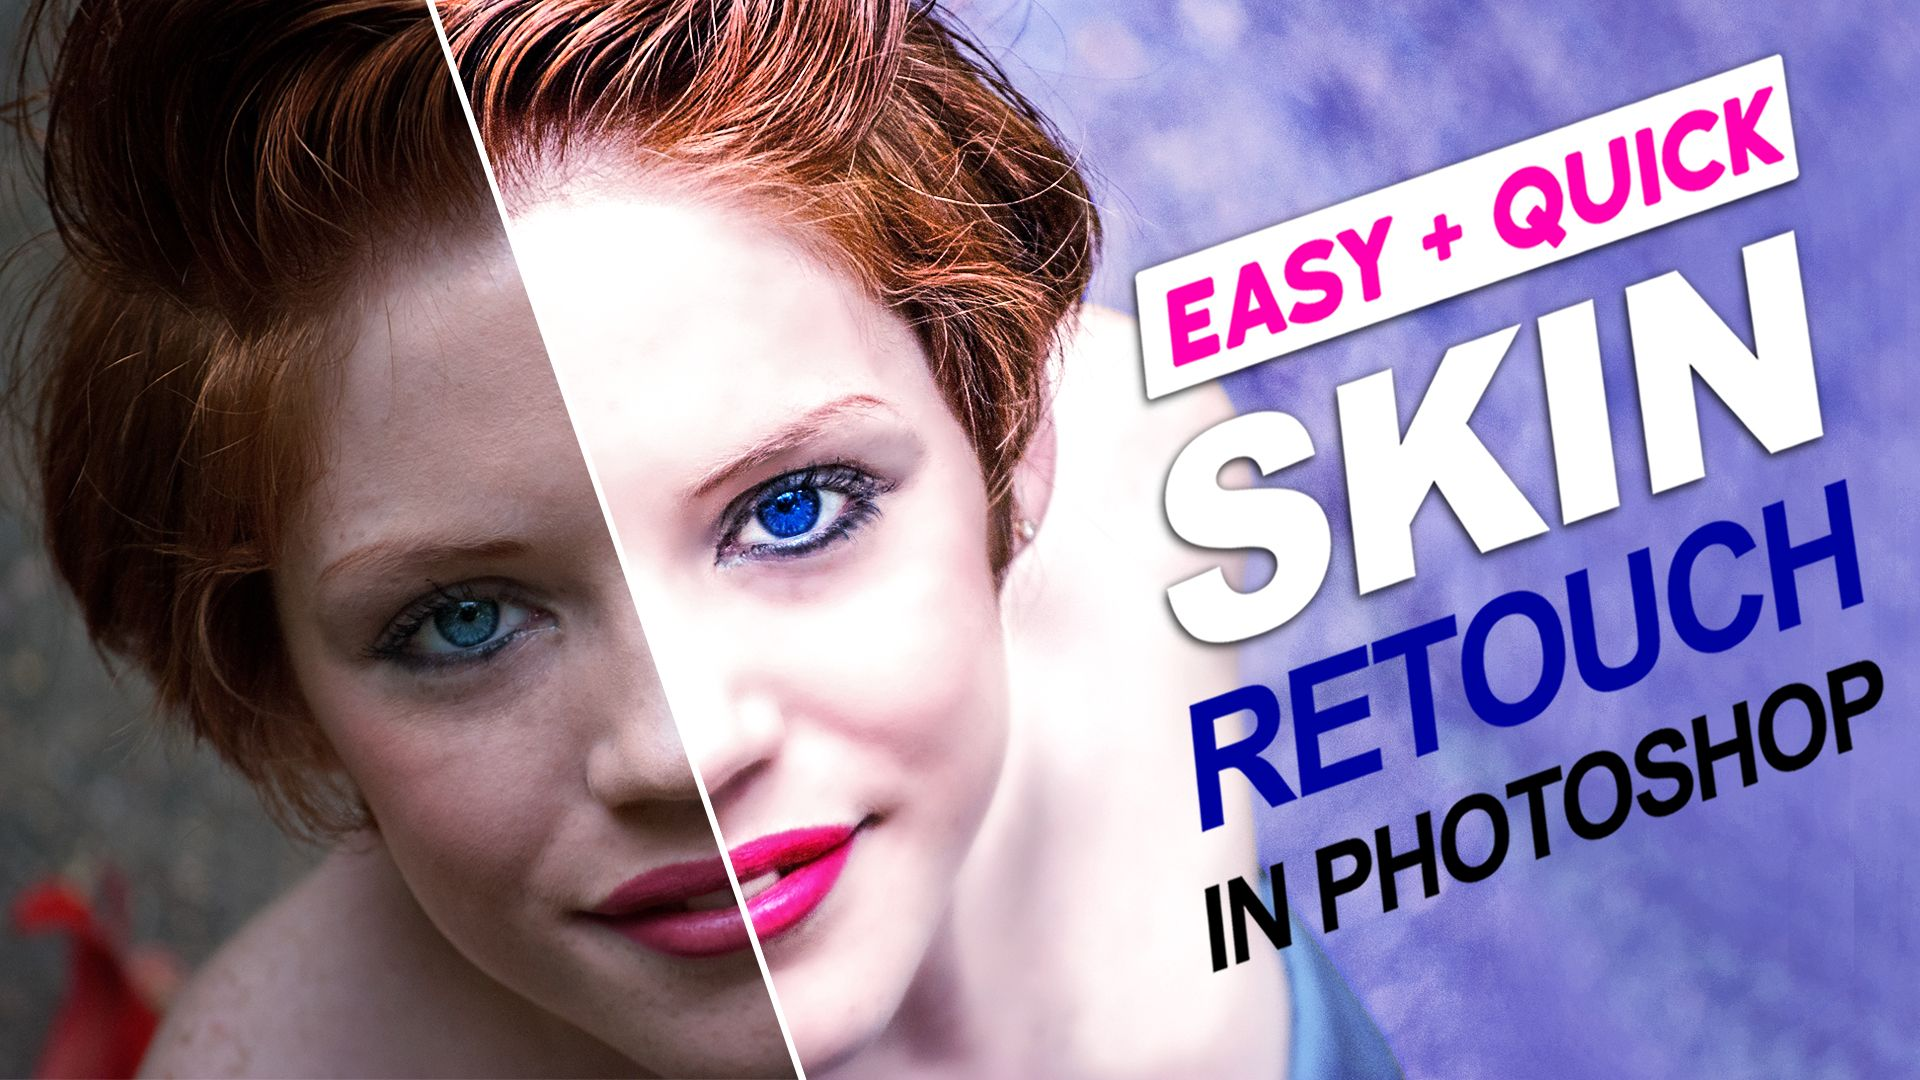 Smooth and soft skin retouching in photoshop easy way beauty smooth and soft skin retouching in photoshop easy way beauty skin retouch tutorial link baditri Choice Image